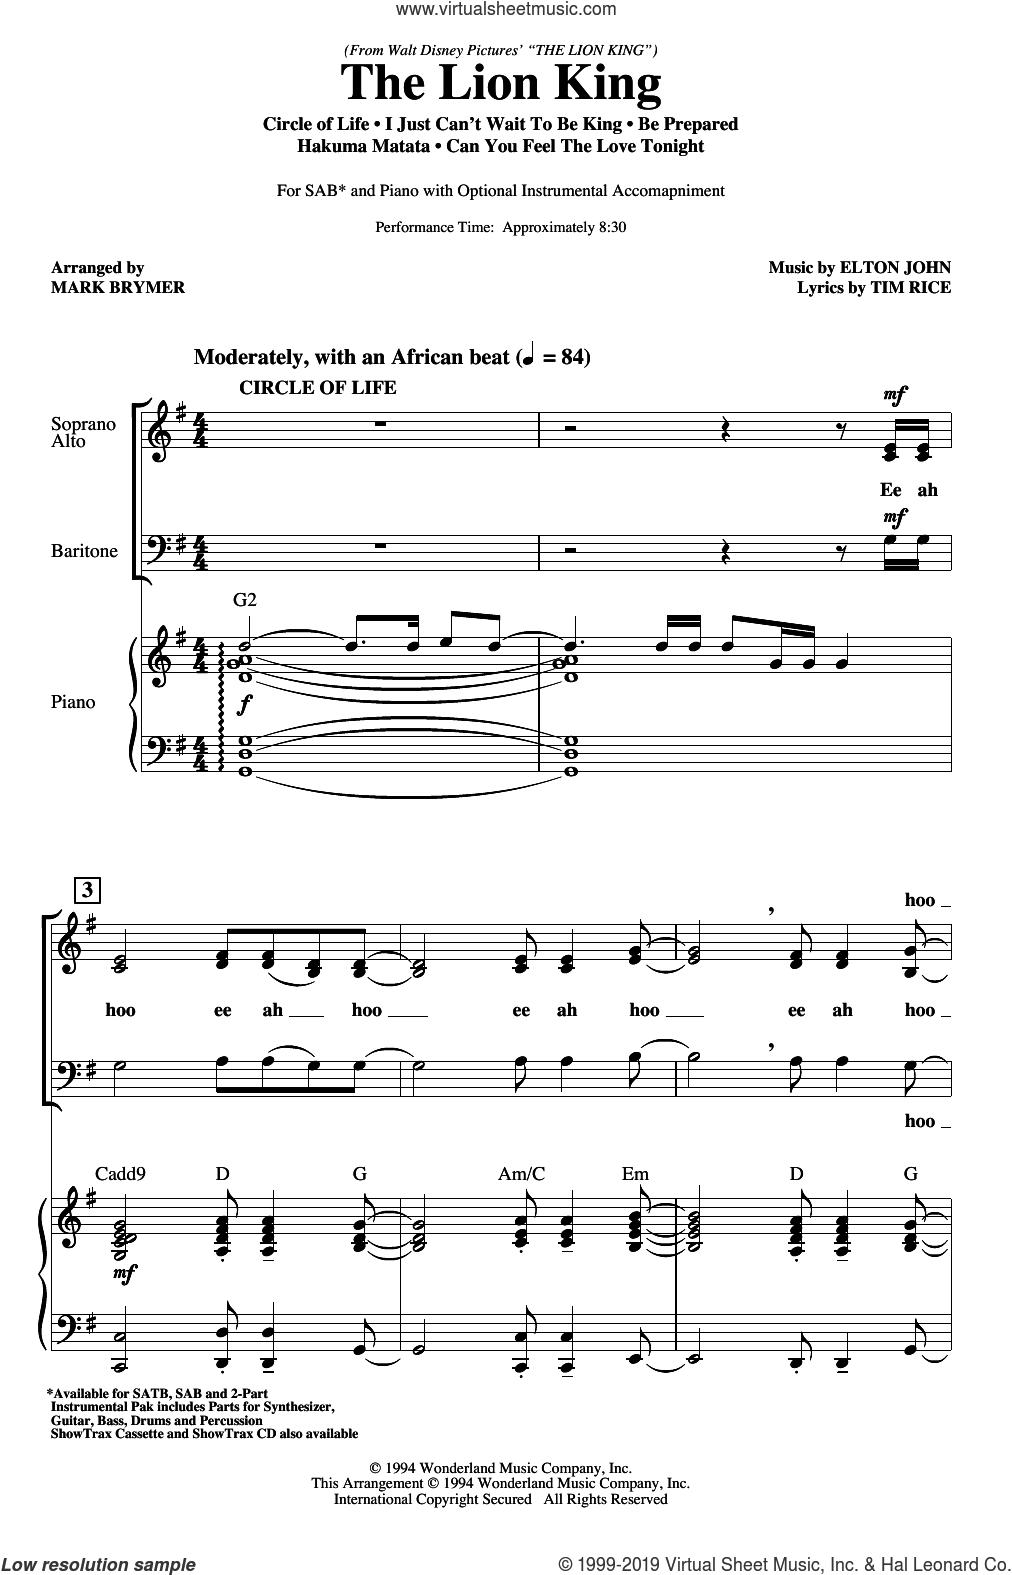 The Lion King (Medley) (arr. Mark Brymer) sheet music for choir (SAB: soprano, alto, bass) by Elton John, Mark Brymer, Elton John & Tim Rice and Tim Rice, intermediate skill level